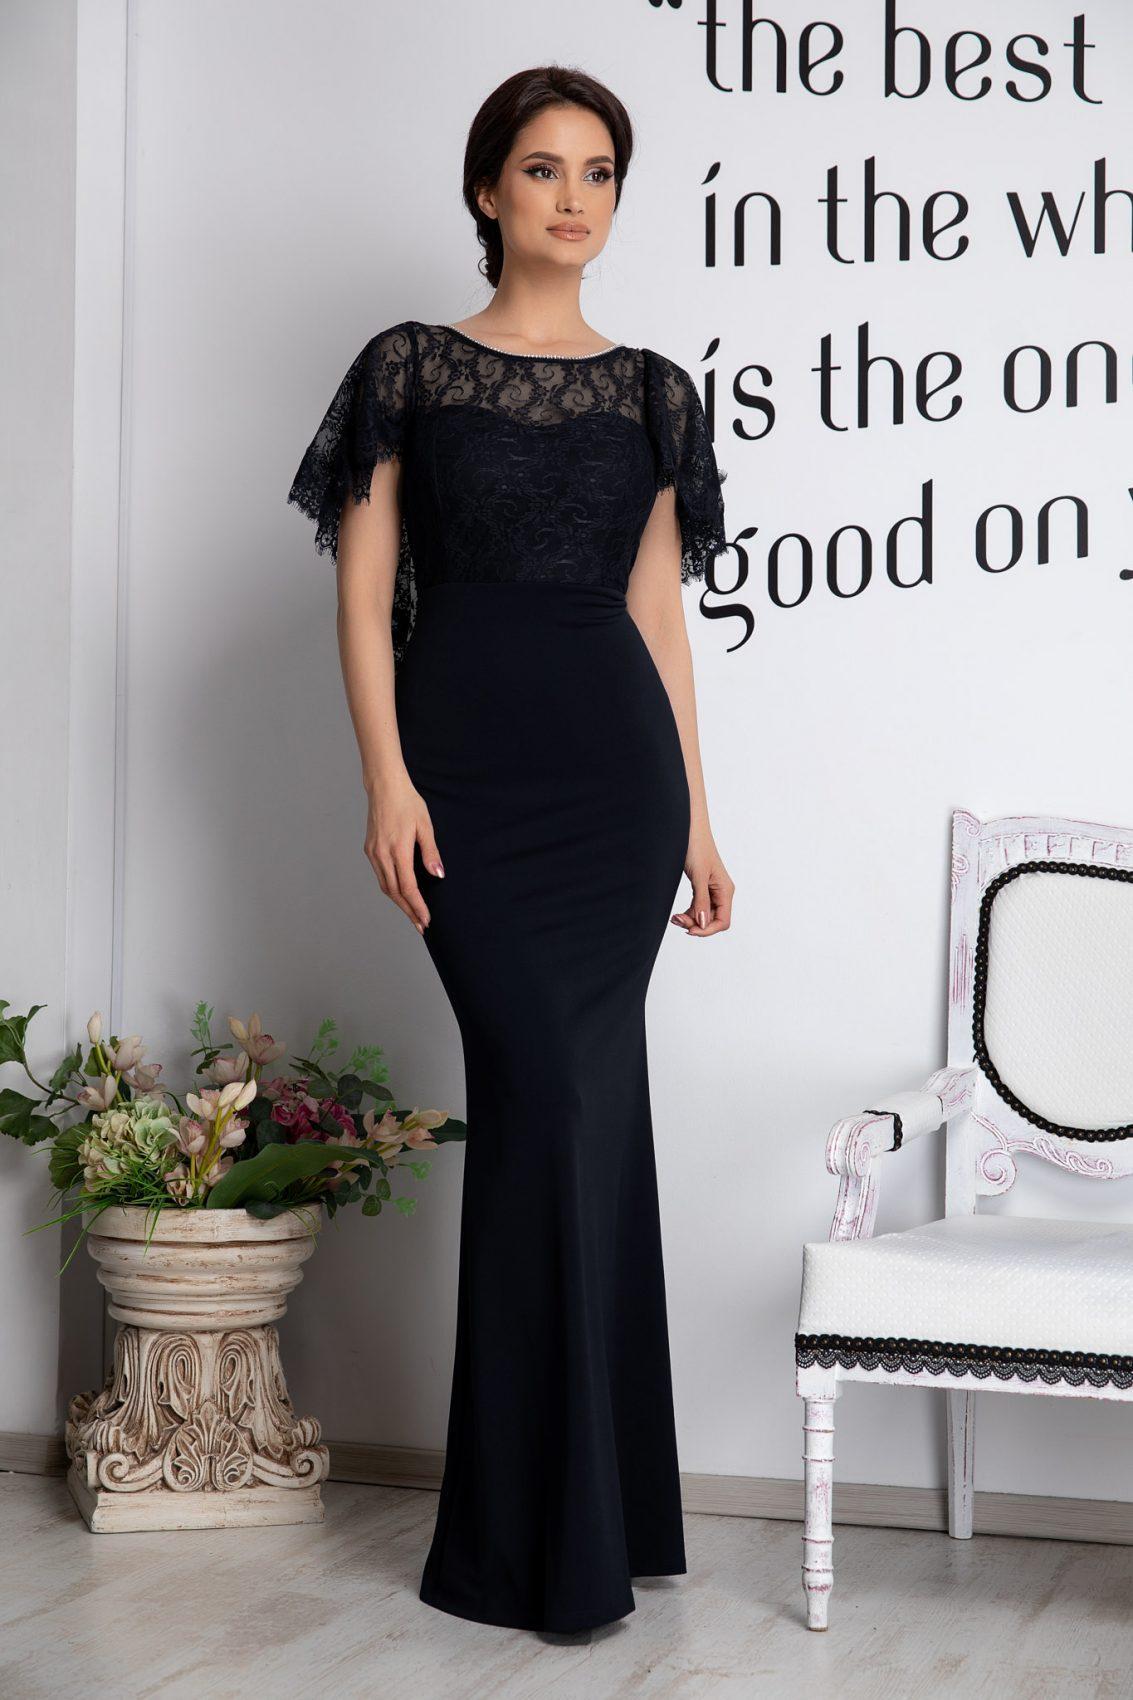 Olimpia Black Dress